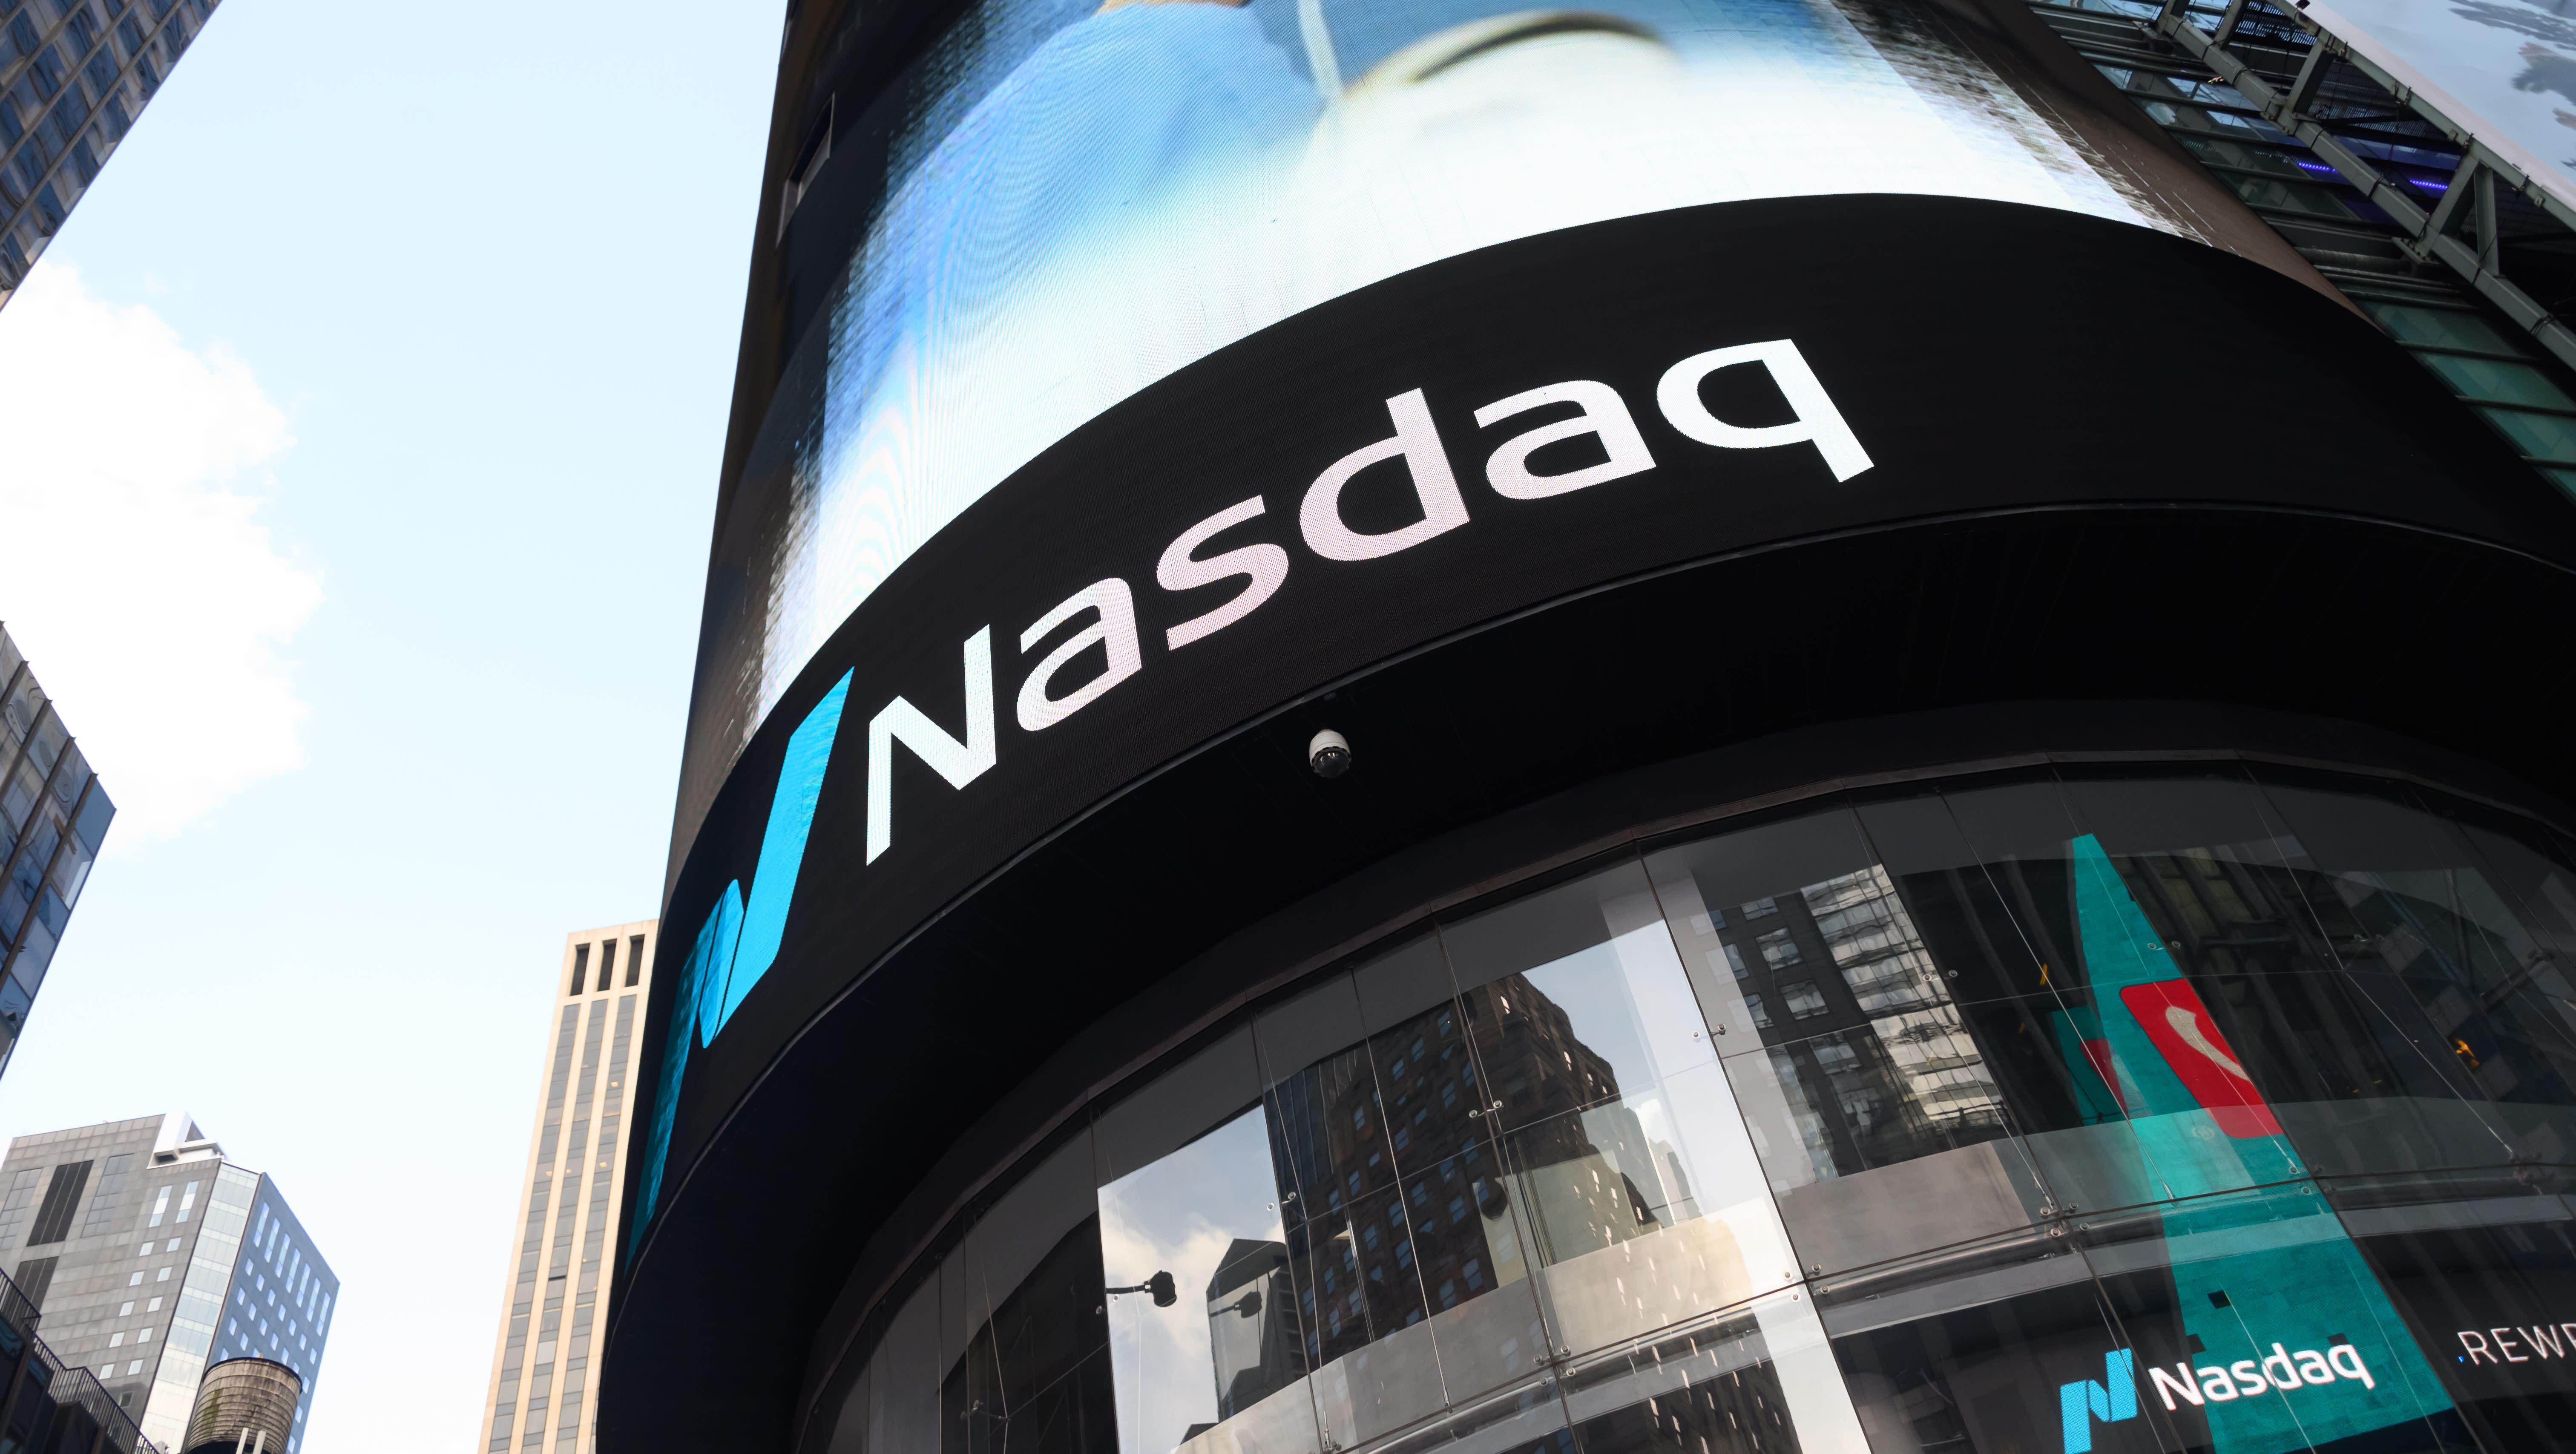 nasdaq stock market closed today